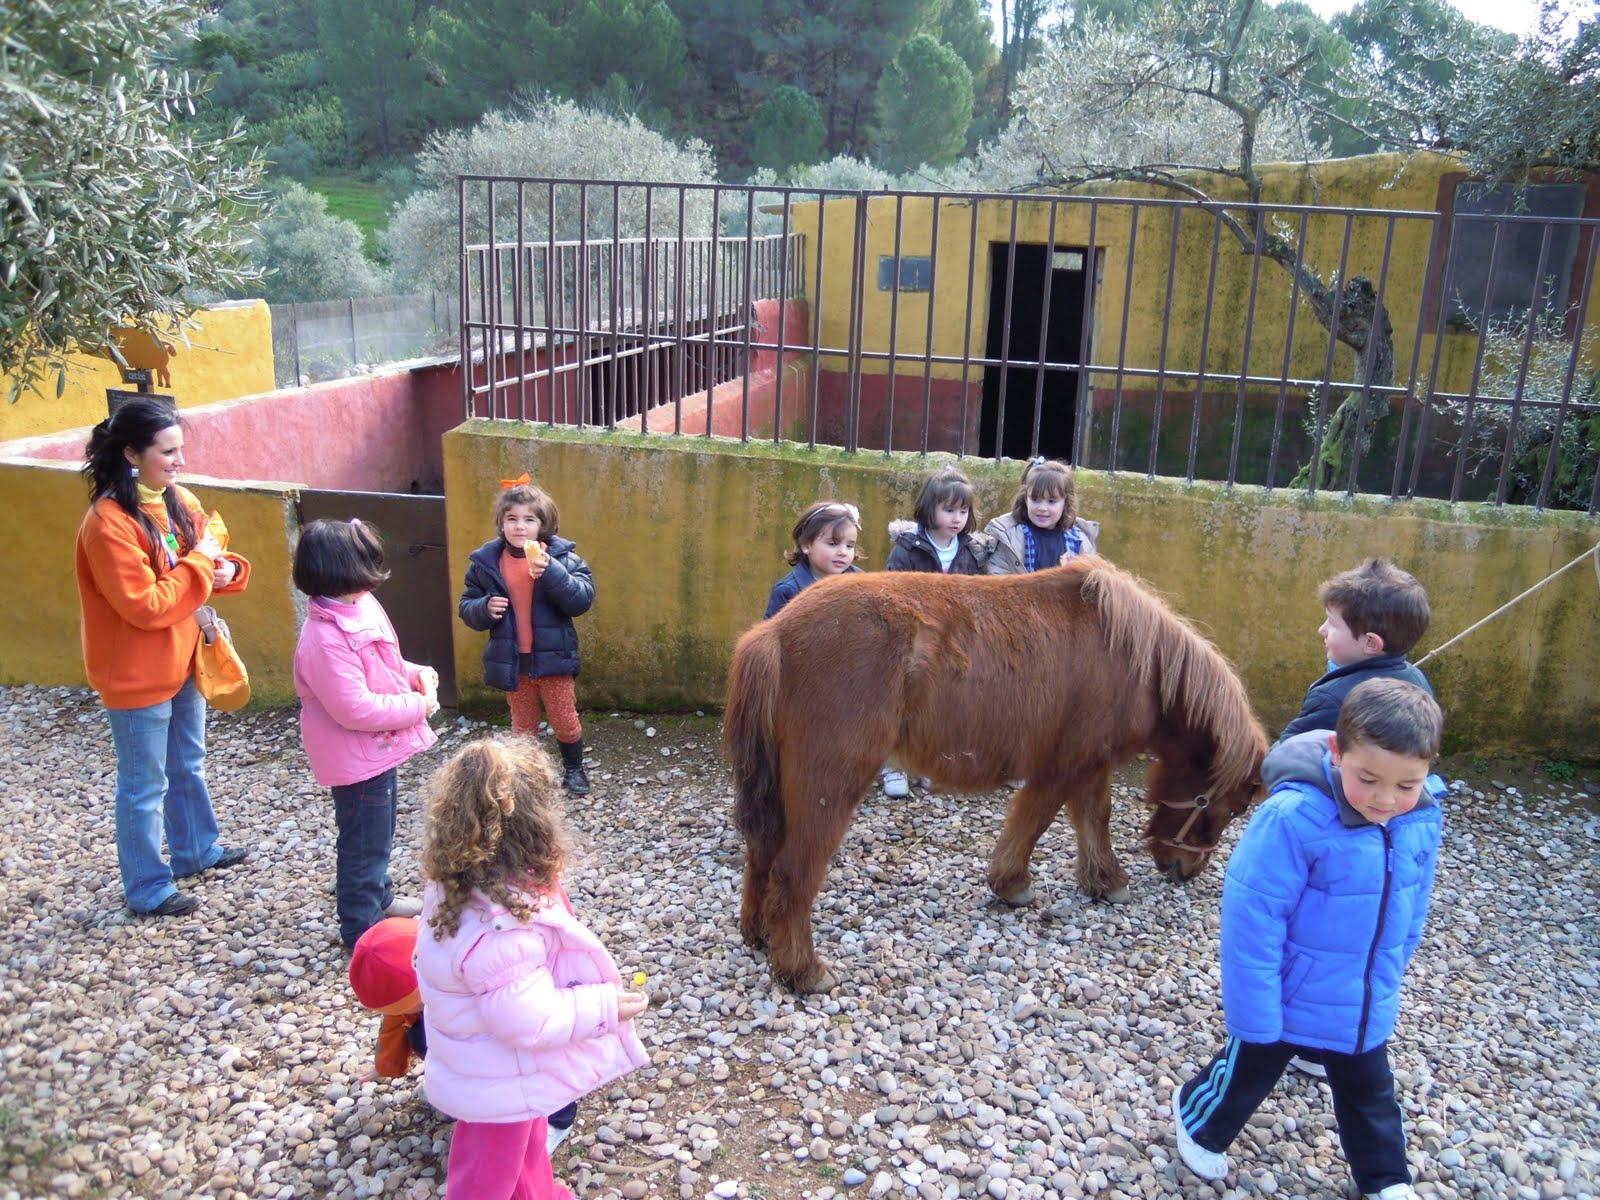 San Sebastian de la Gomer Spain  city photos : SAN SEBASTIÁN: Visita a la granja escuela de Cabriñana